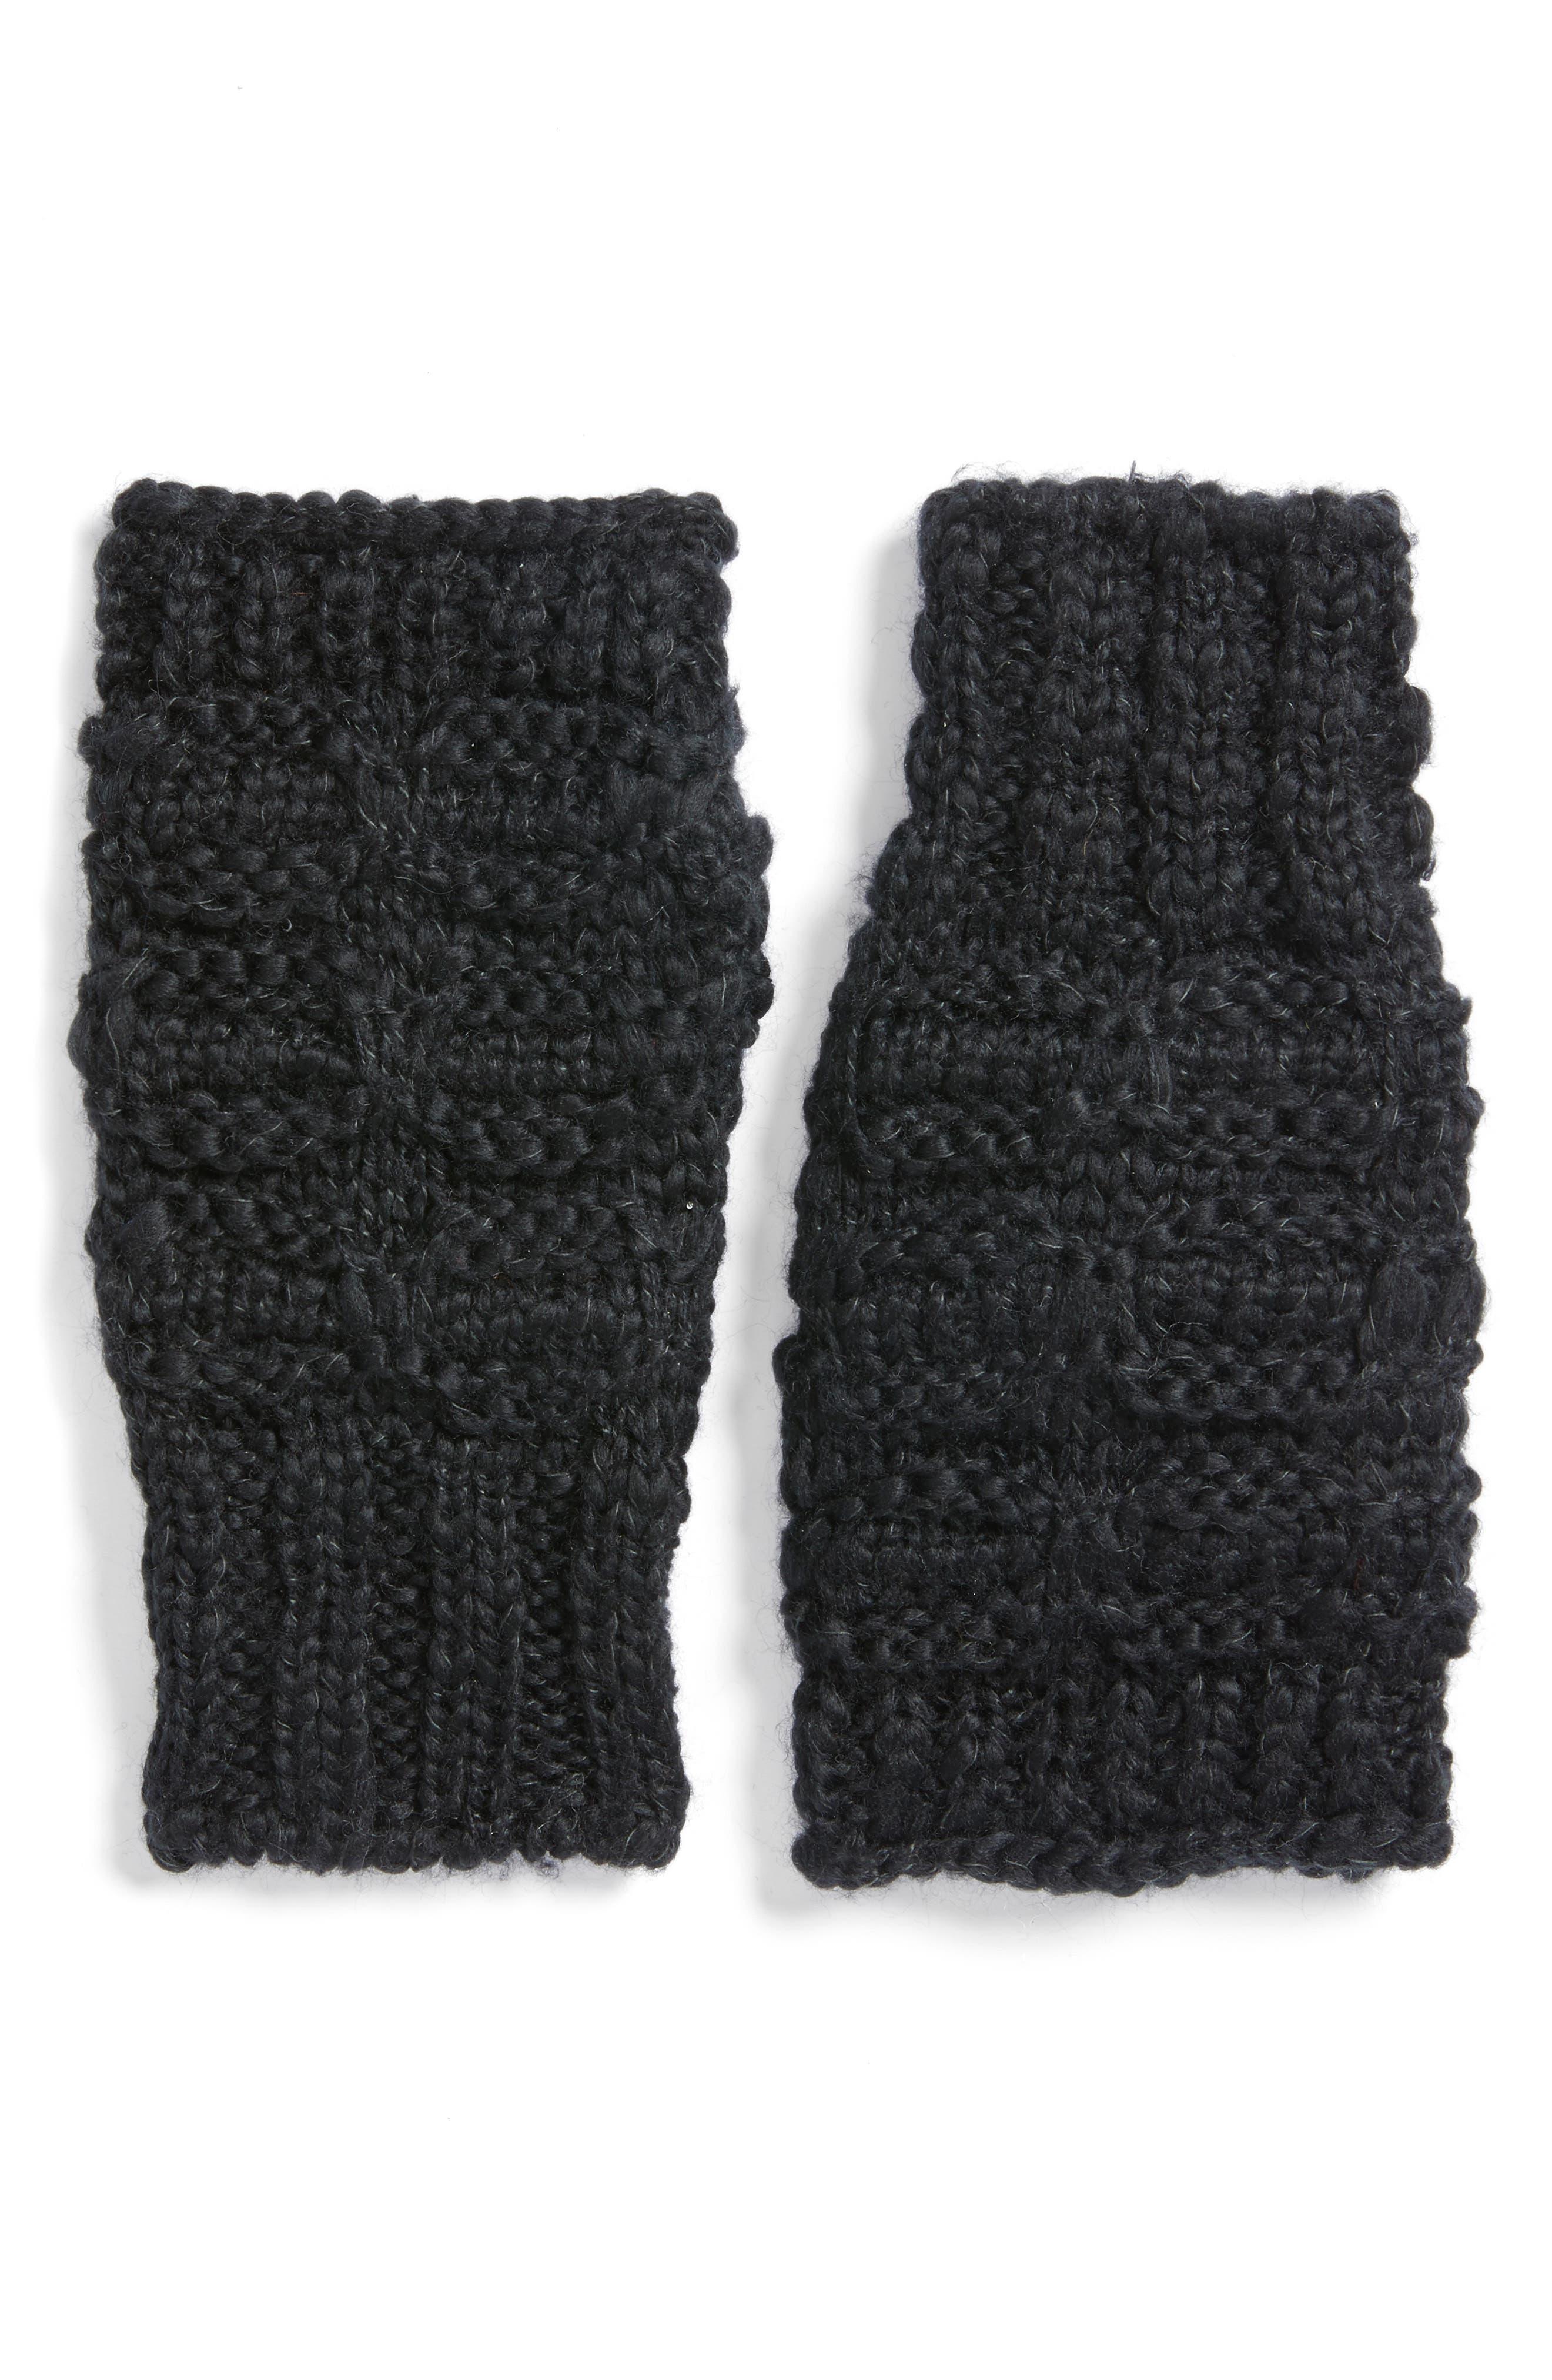 Alternate Image 1 Selected - Treasure & Bond Chunky Knit Arm Warmers